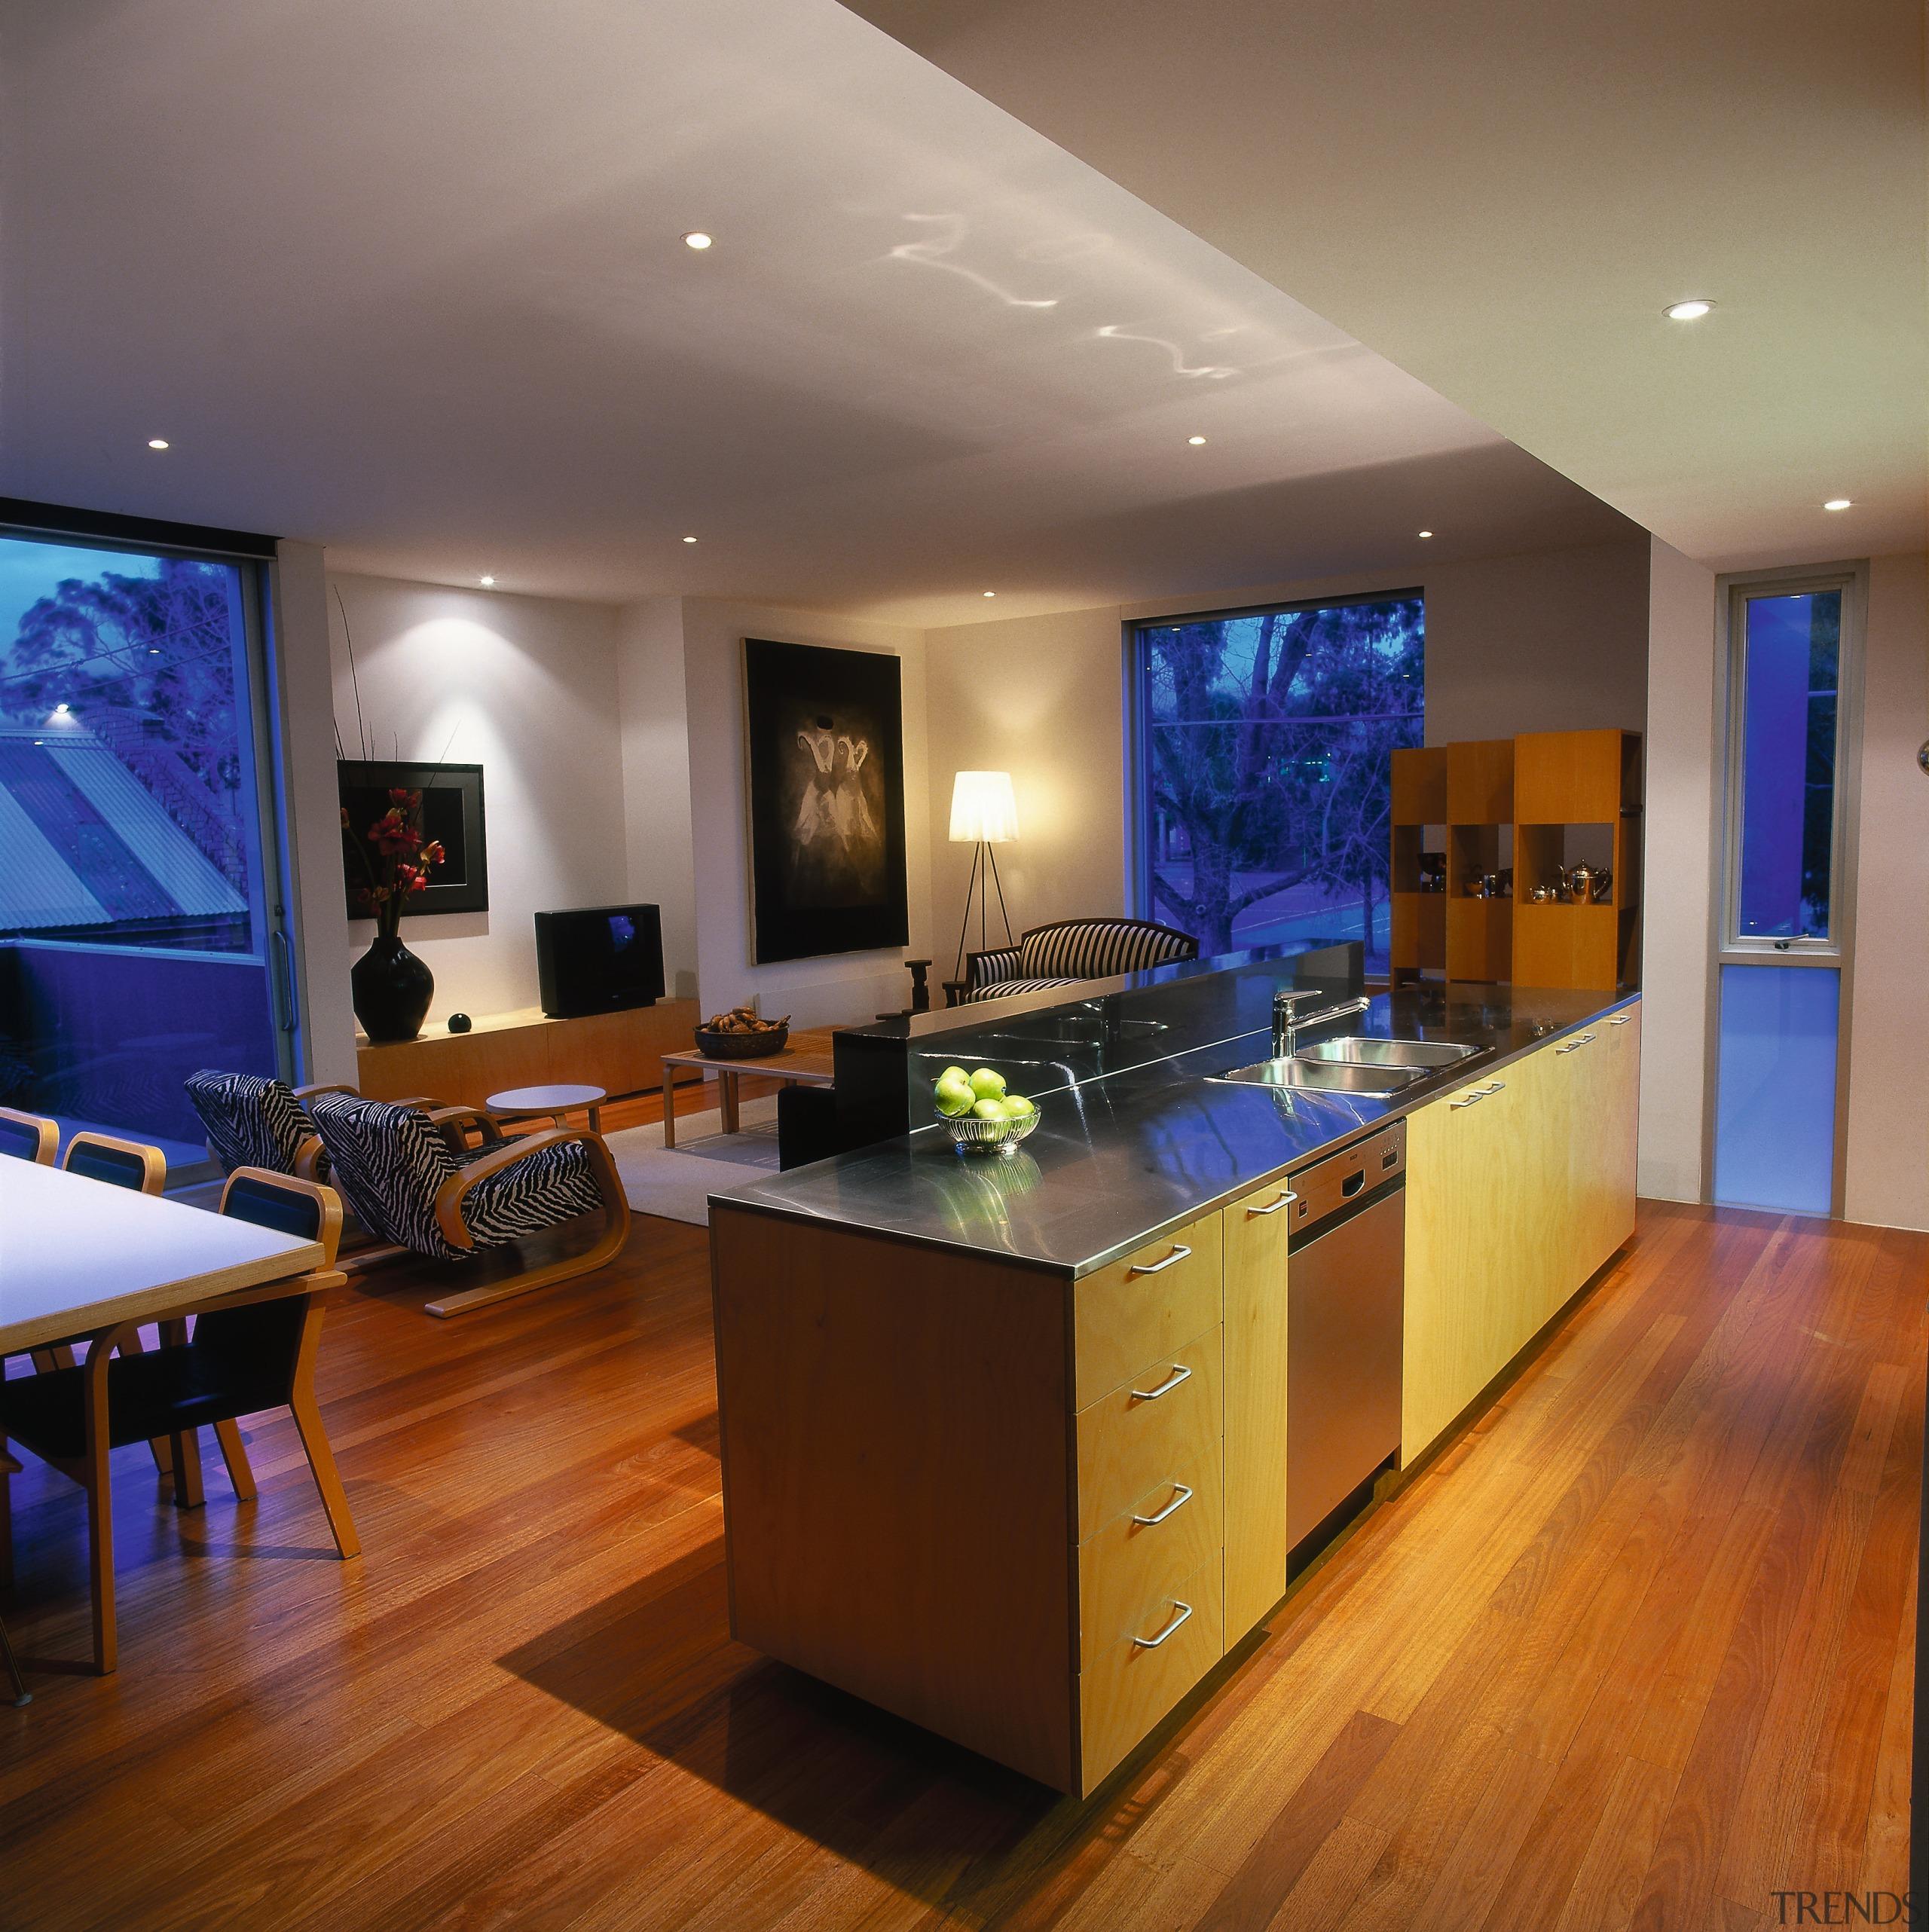 View of this modern kitchen - View of ceiling, countertop, floor, flooring, hardwood, interior design, kitchen, real estate, room, wood flooring, brown